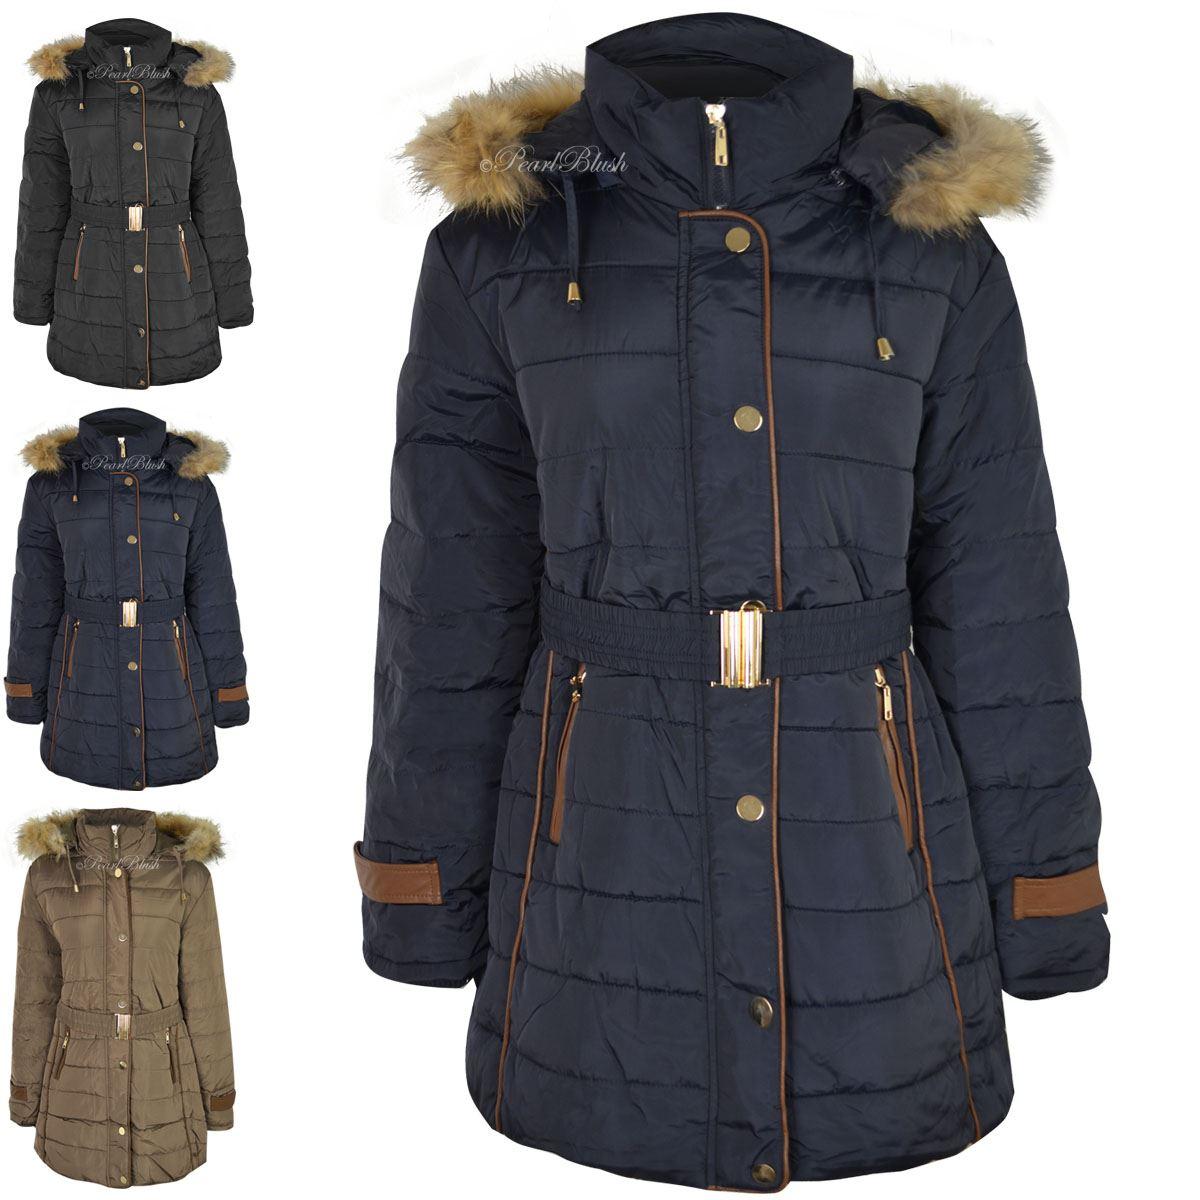 Large size womens coats